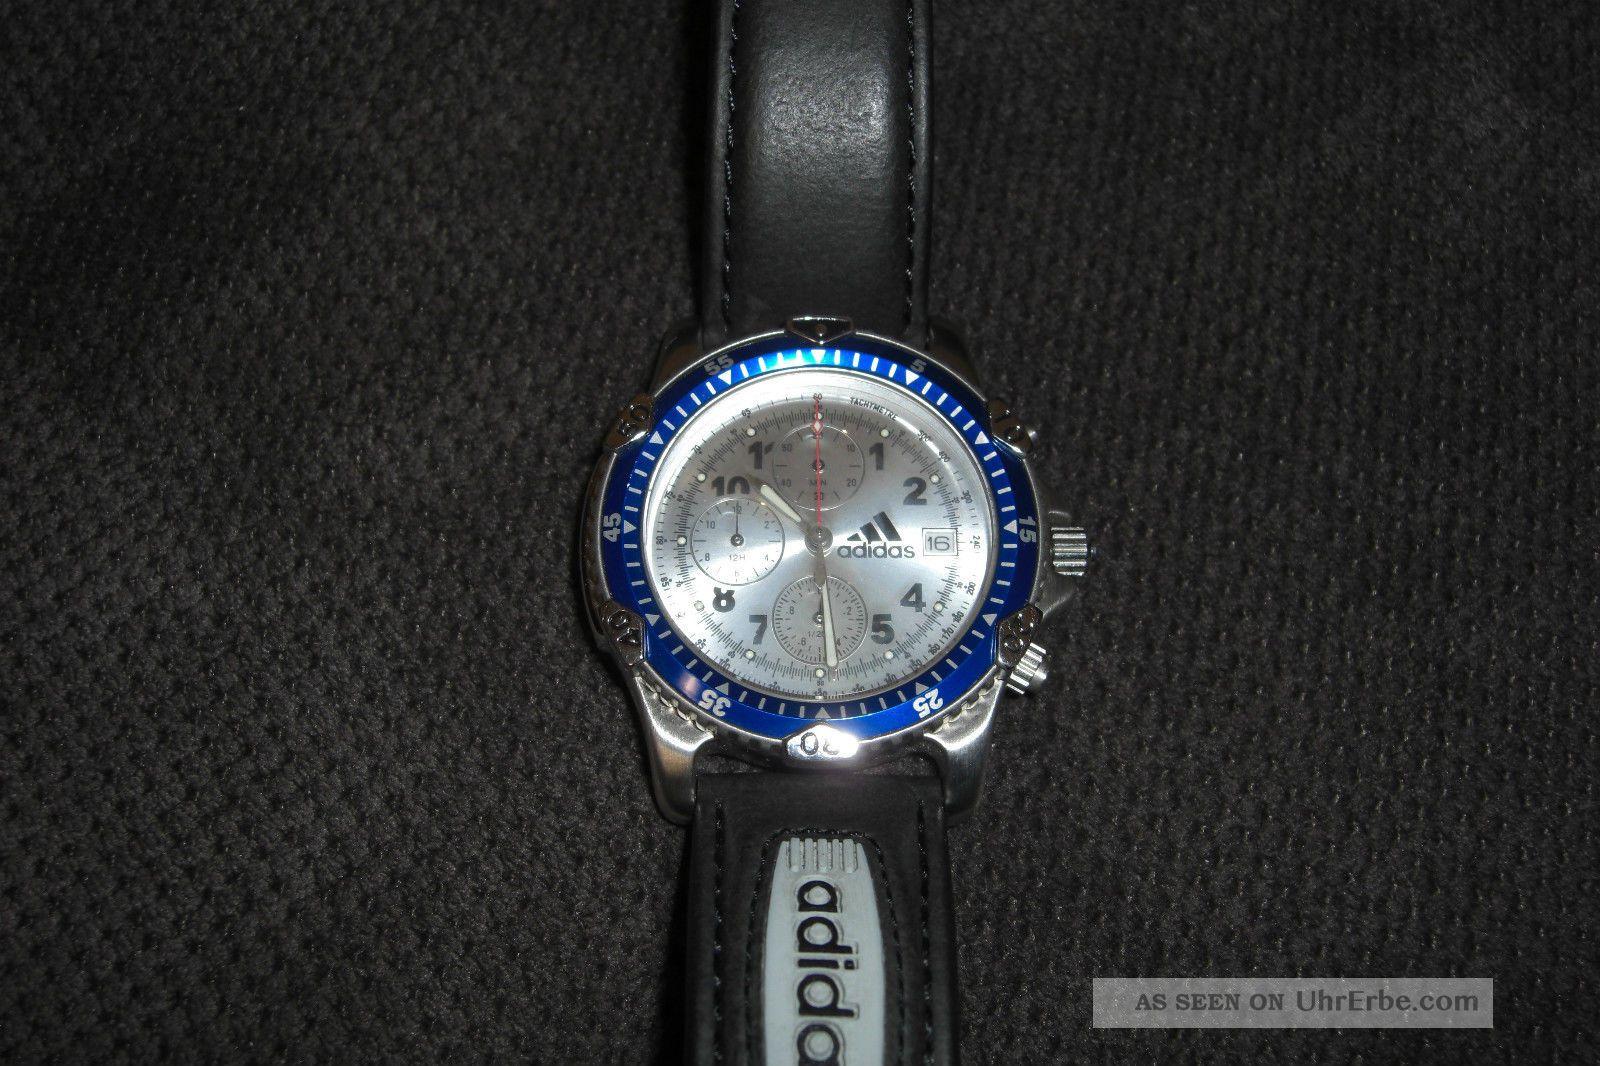 Adidas Chronograph Armband Uhr Armbanduhren Bild